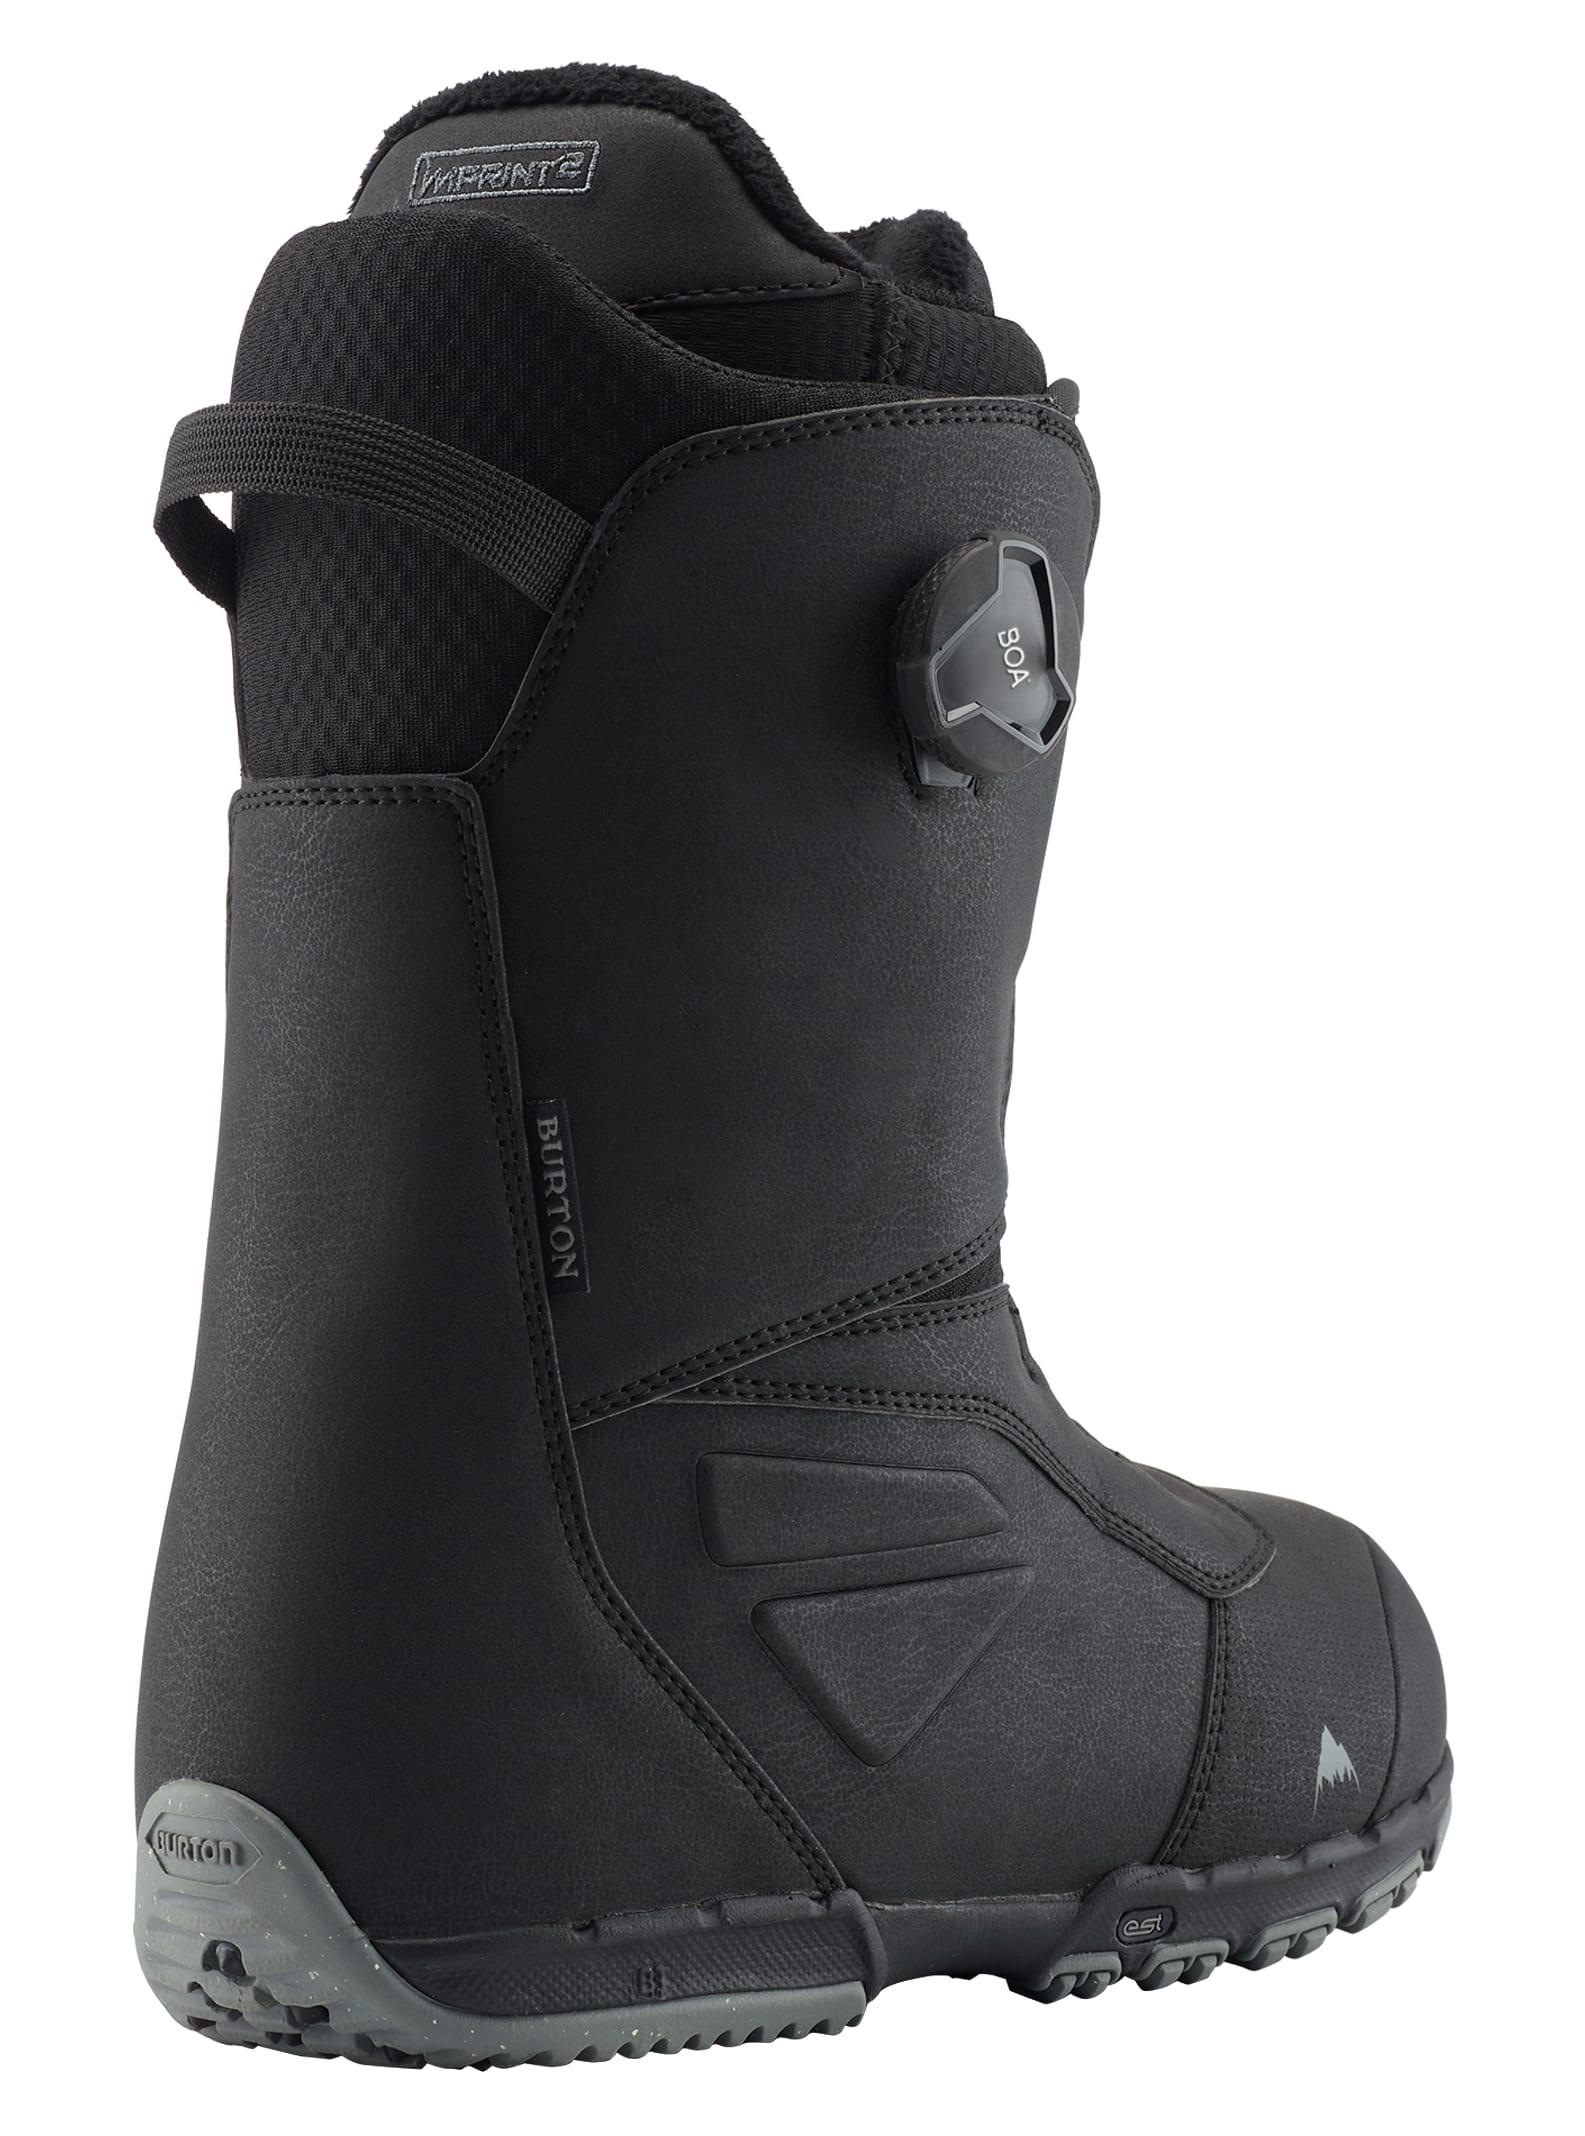 De De Boots De Snowboard Snowboards Boots HommeBurton Snowboard Boots Snowboards HommeBurton 7Yfgb6vy